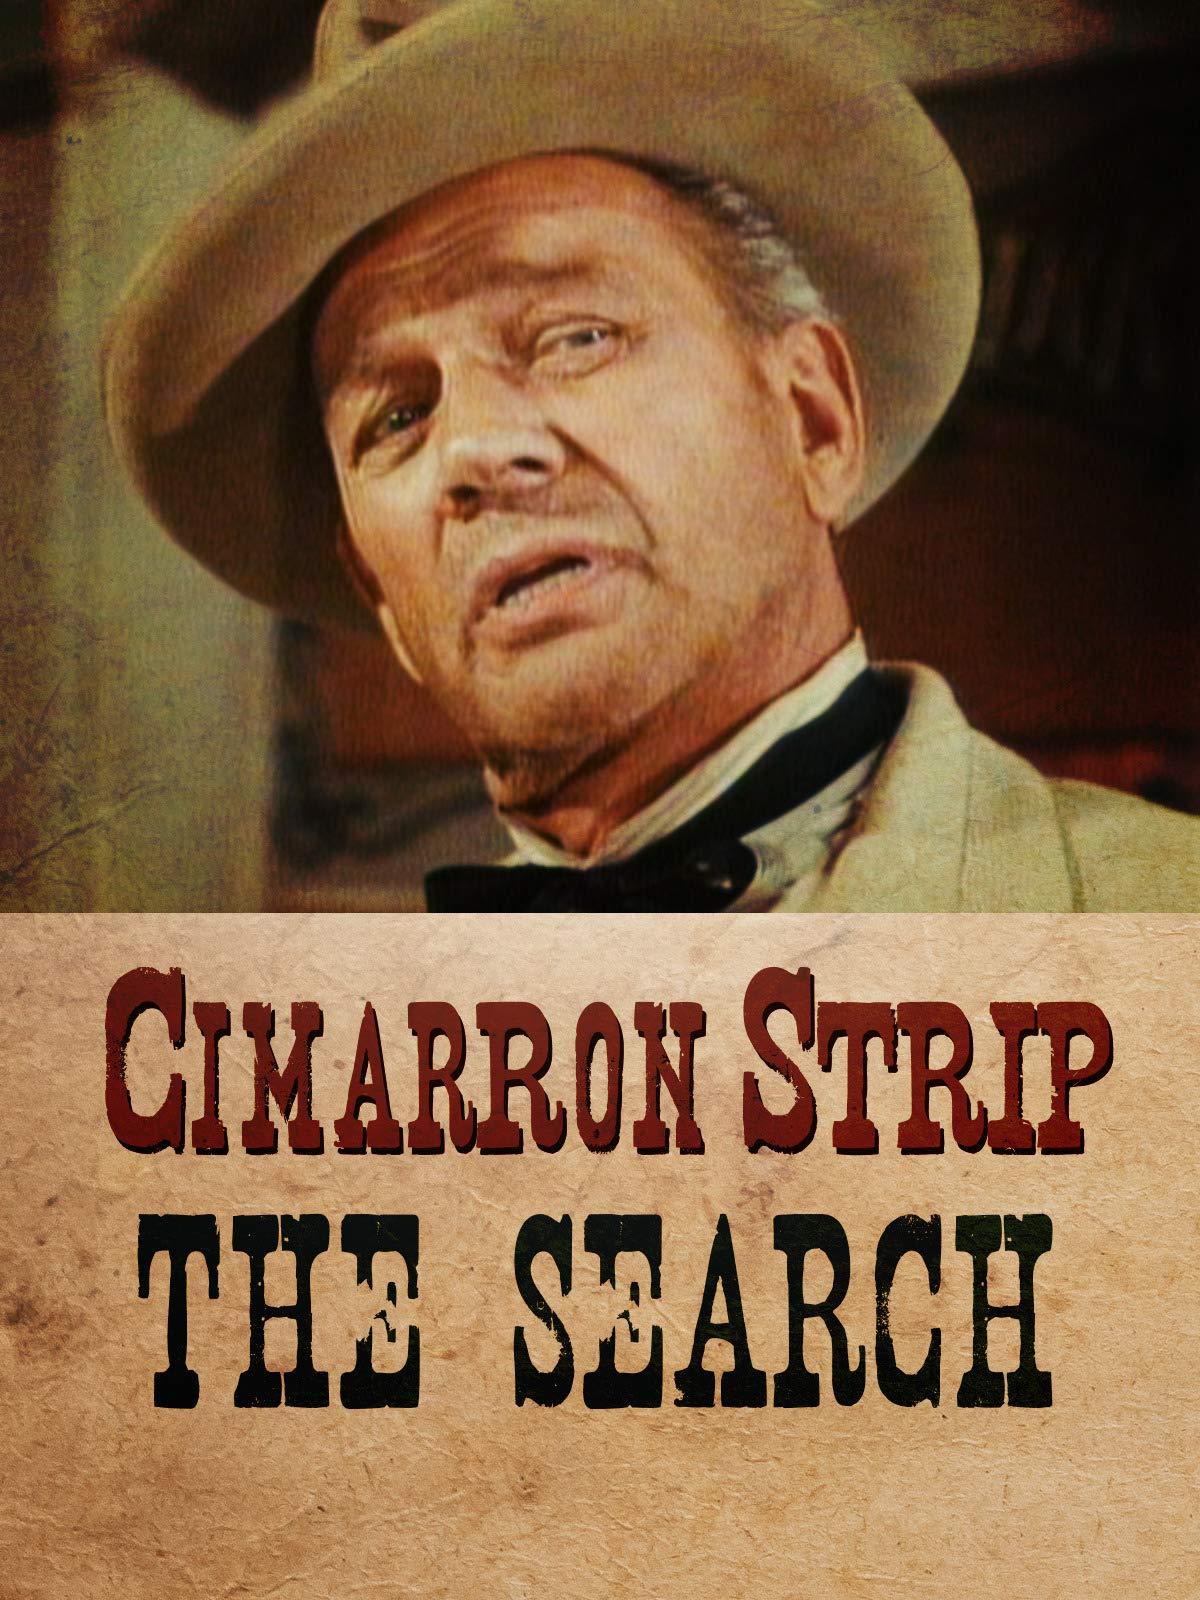 Cimarron Strip - The Search on Amazon Prime Video UK